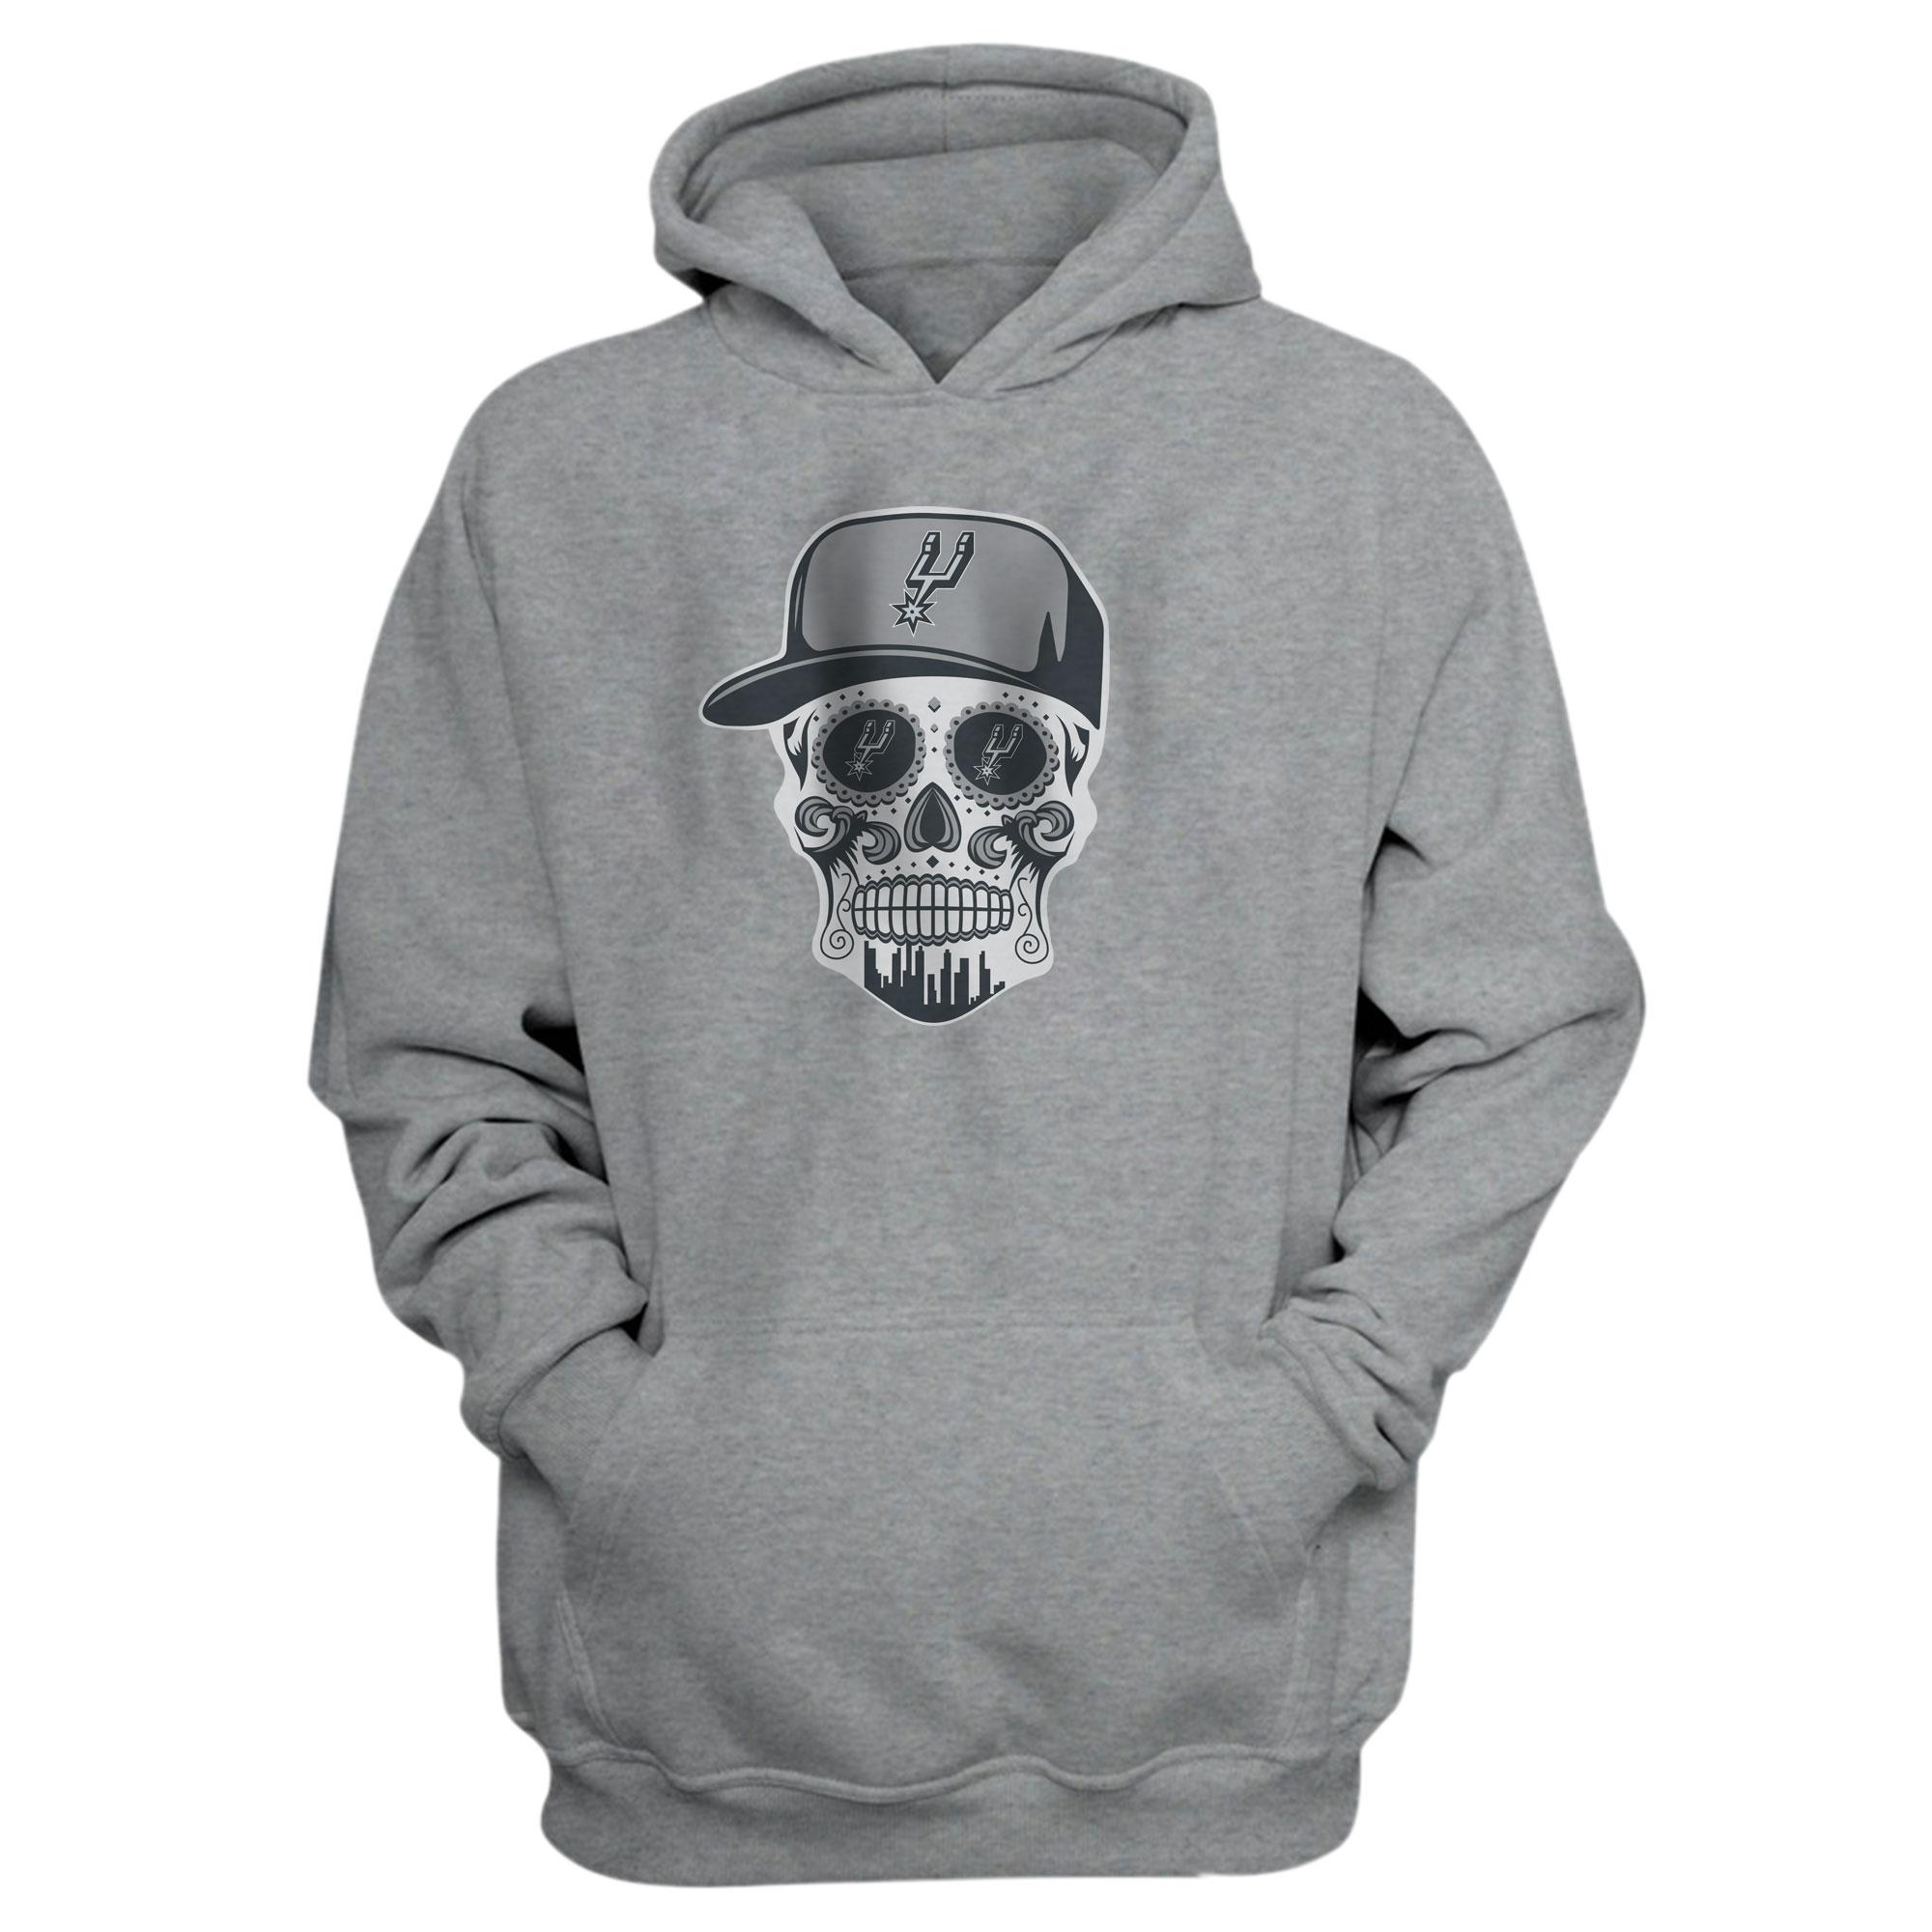 Spurs Skull Hoodie (HD-GRY-NP-464-NBA-SPURS-SKULL)